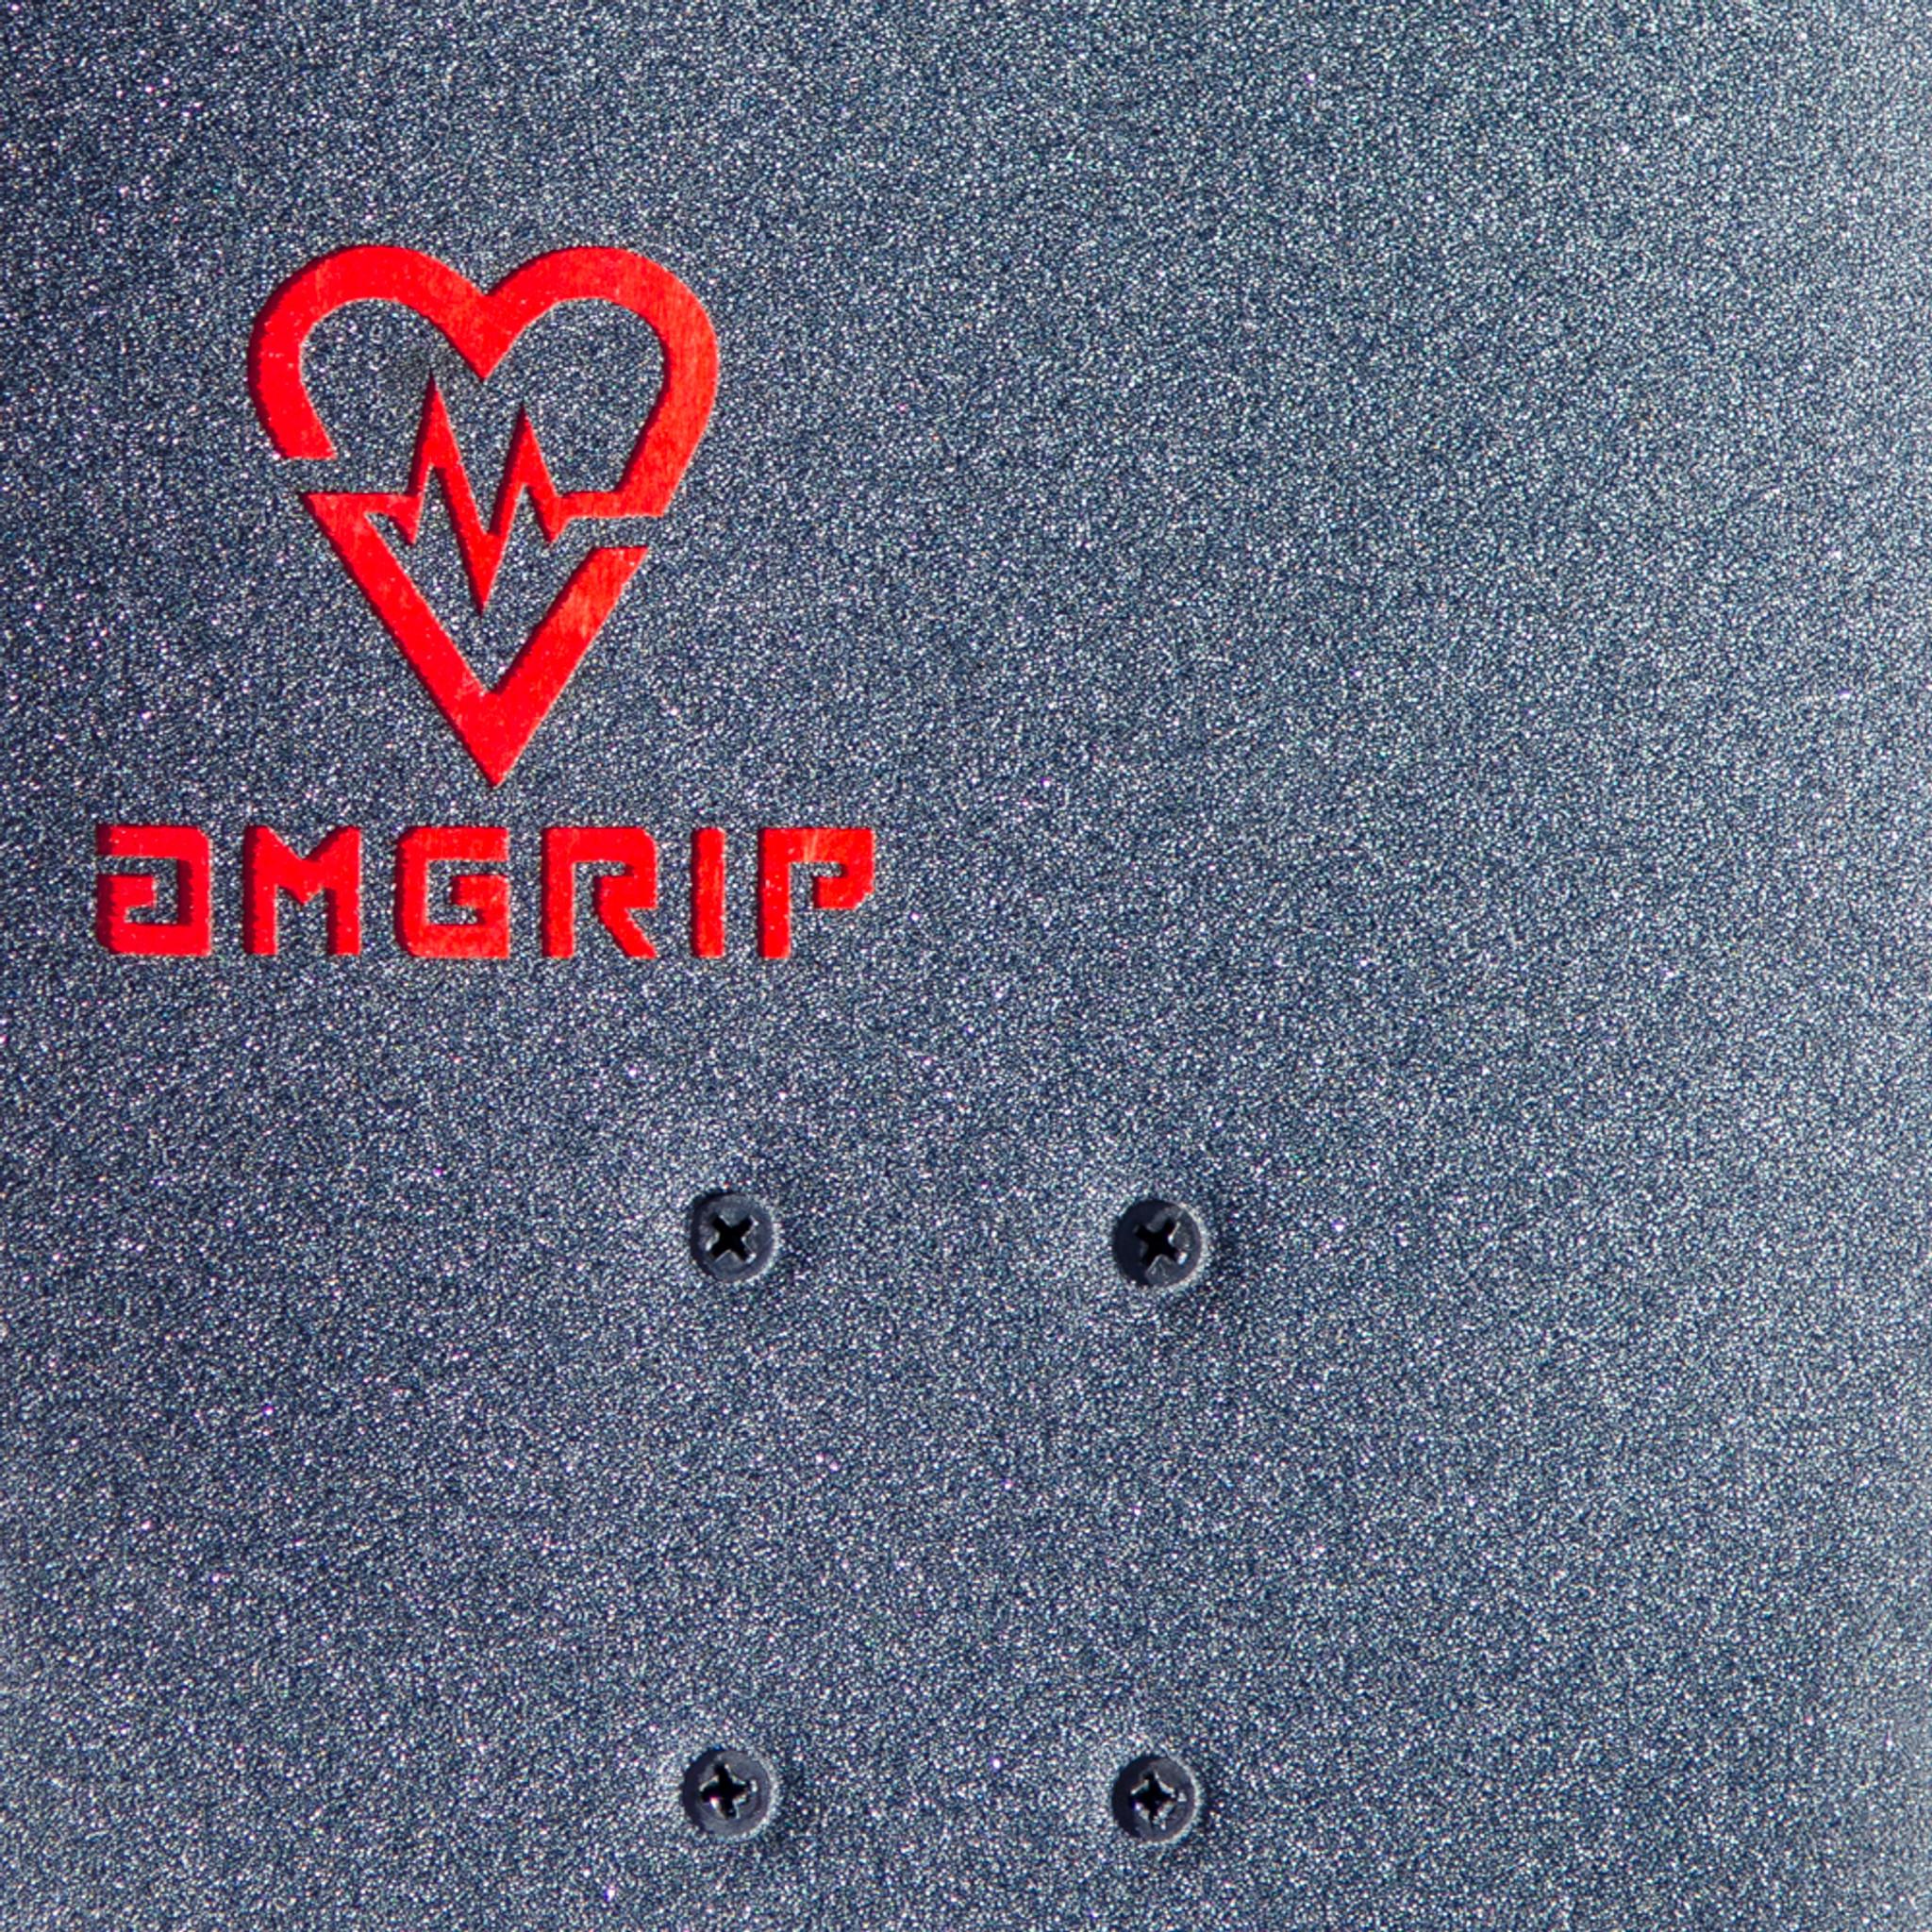 Black AmGrip X Force Collab Skateboard Grip Tape